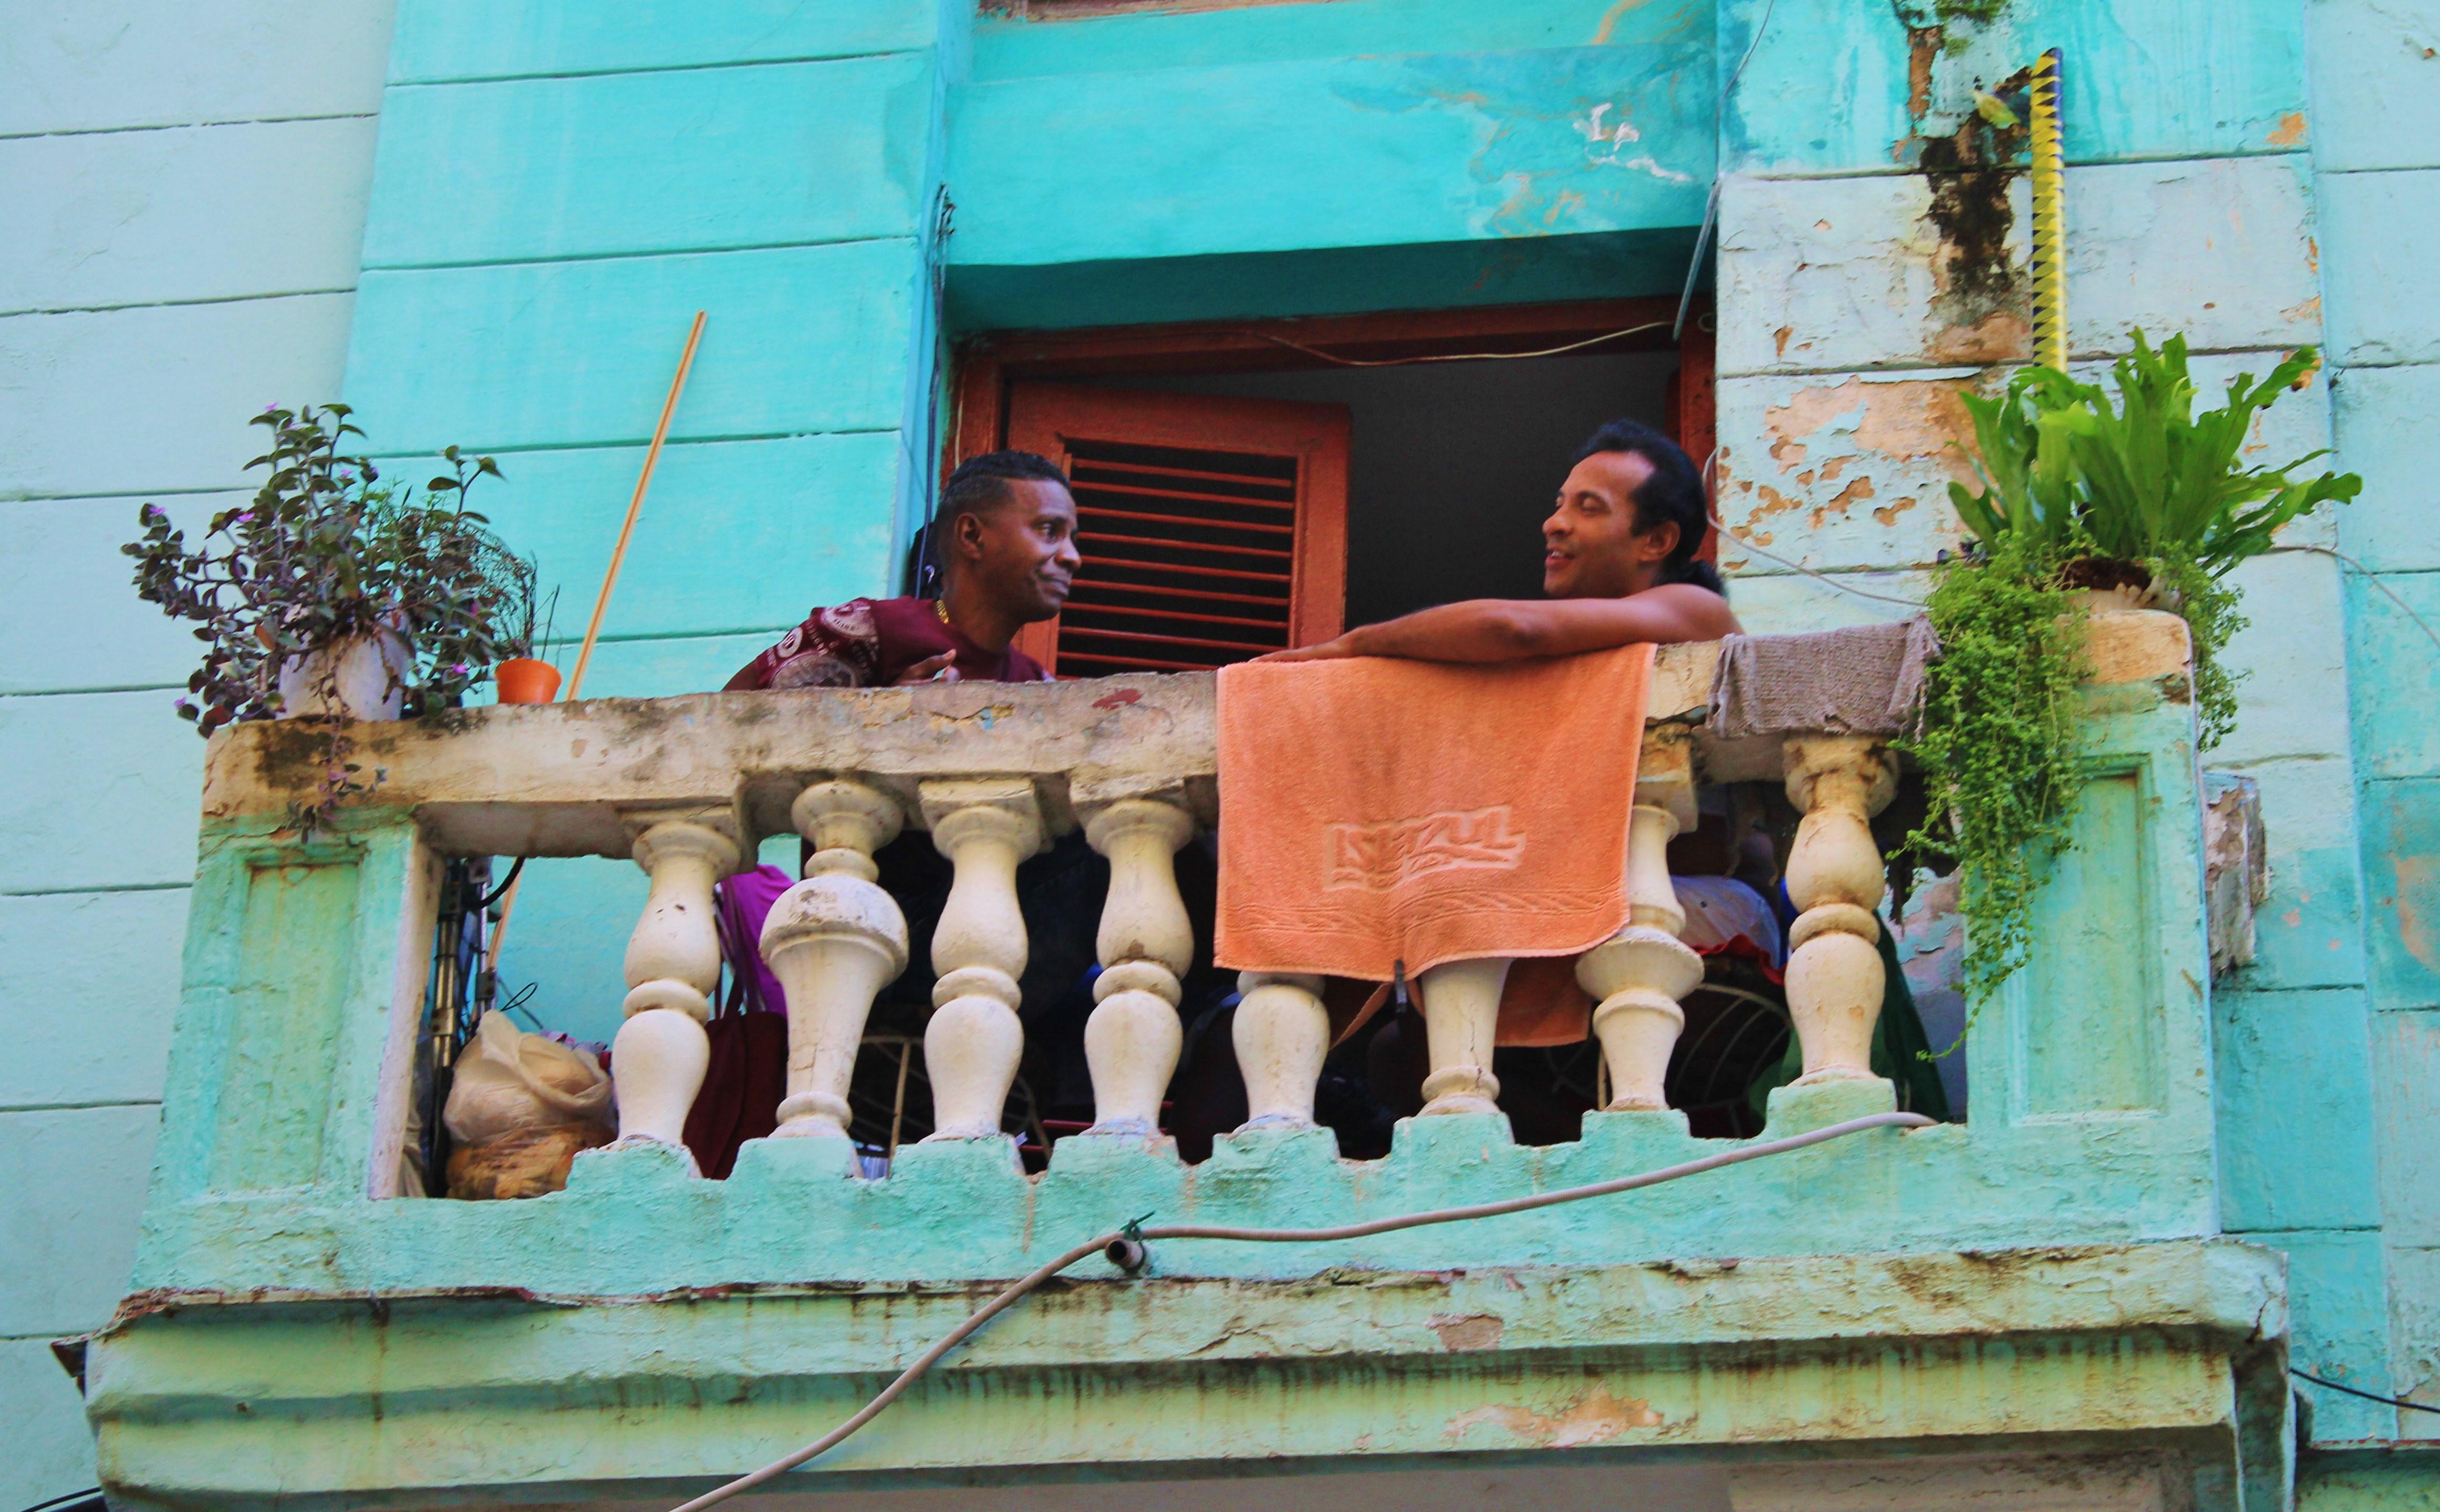 img_8014 The Cuba Conundrum Cuba Havana